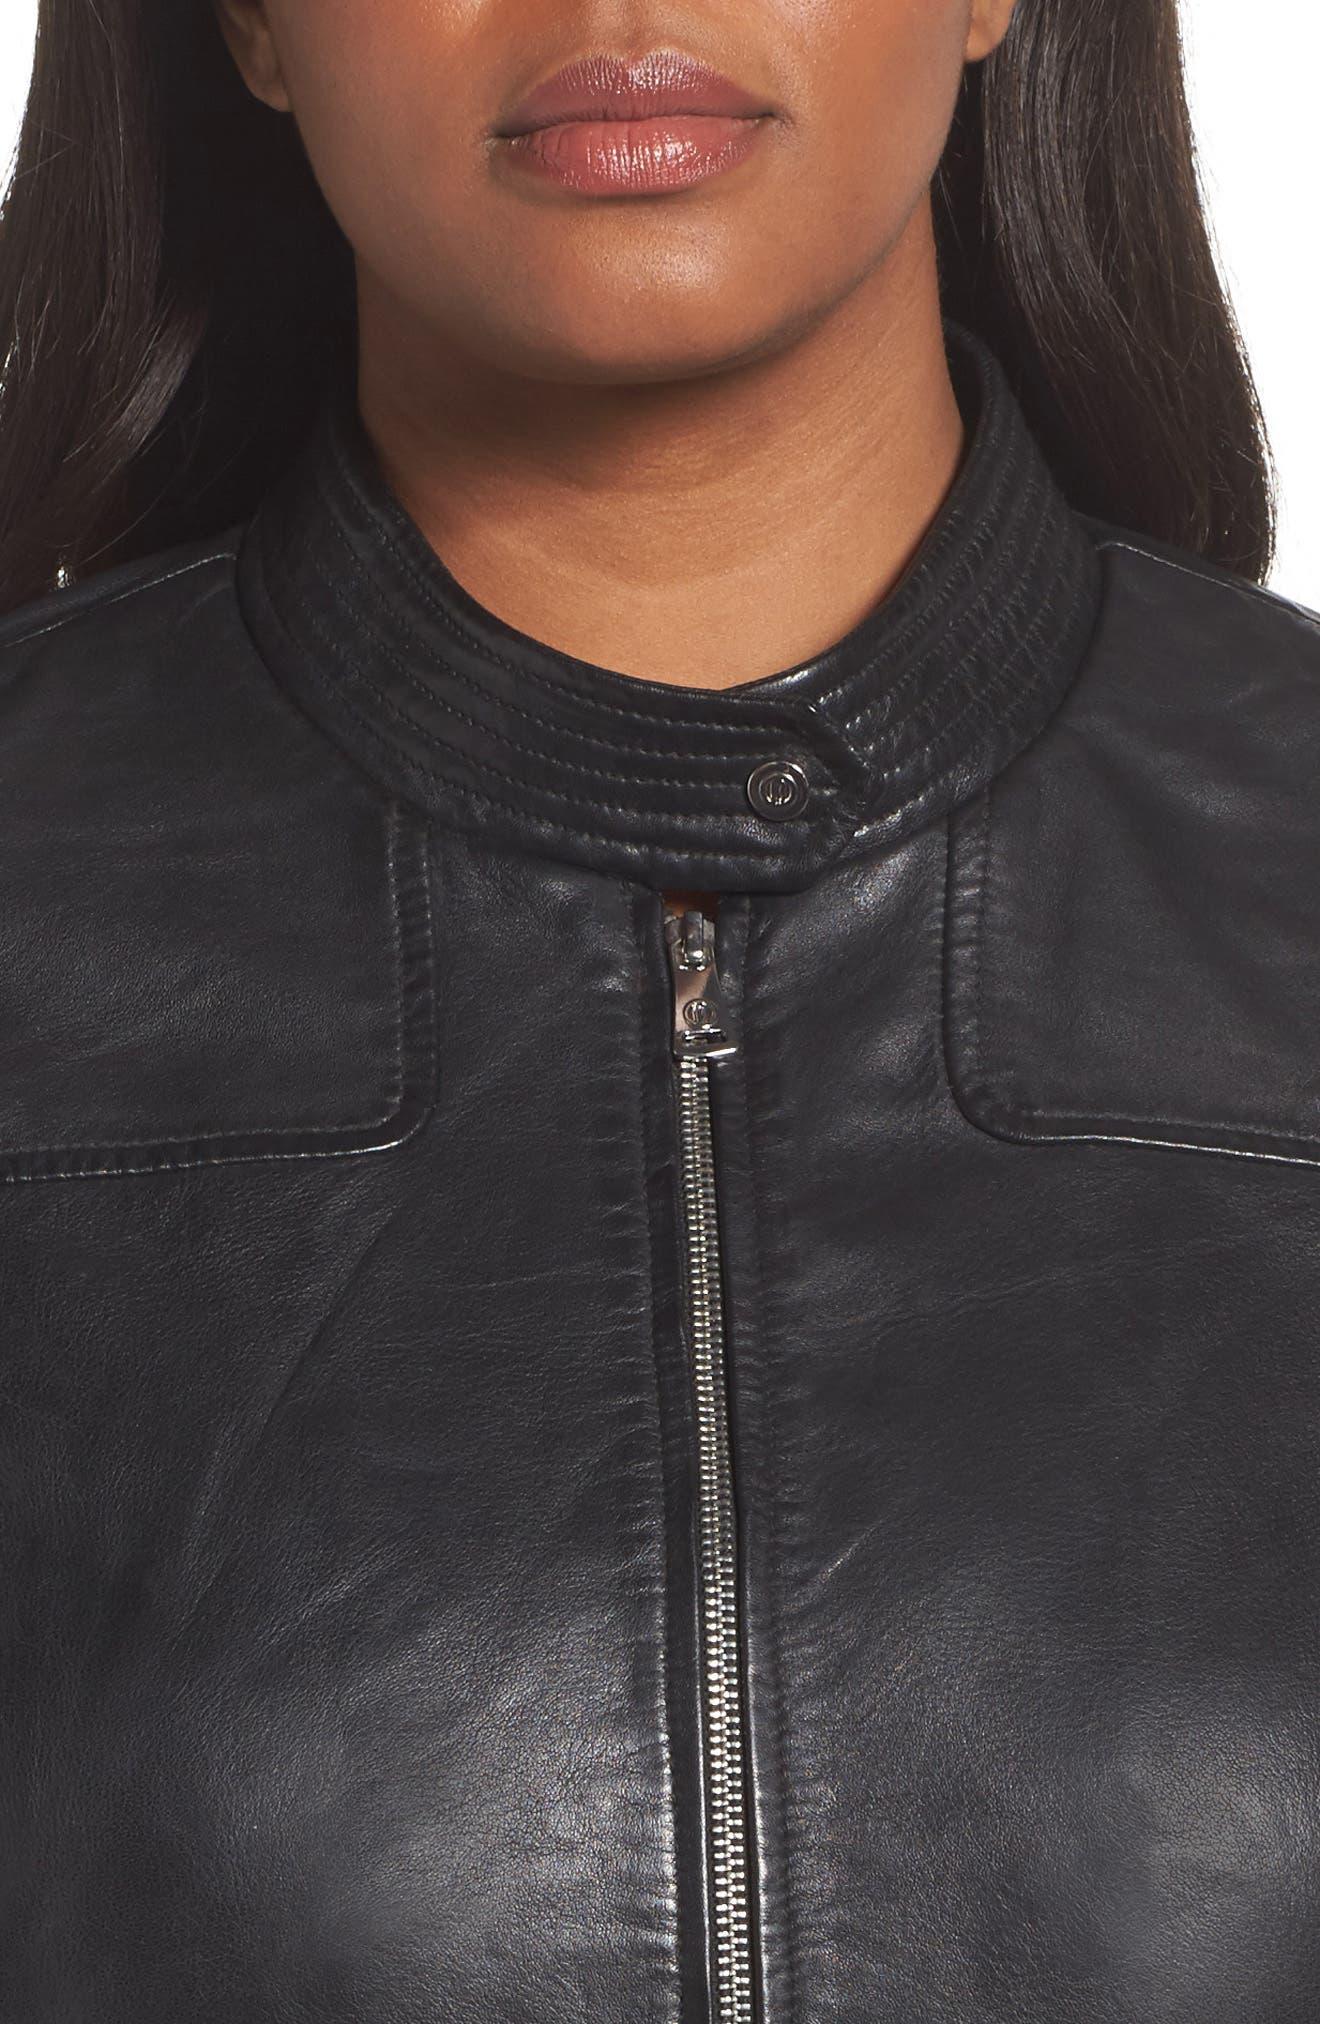 Kirwin Sheepskin Leather Jacket,                             Alternate thumbnail 4, color,                             001